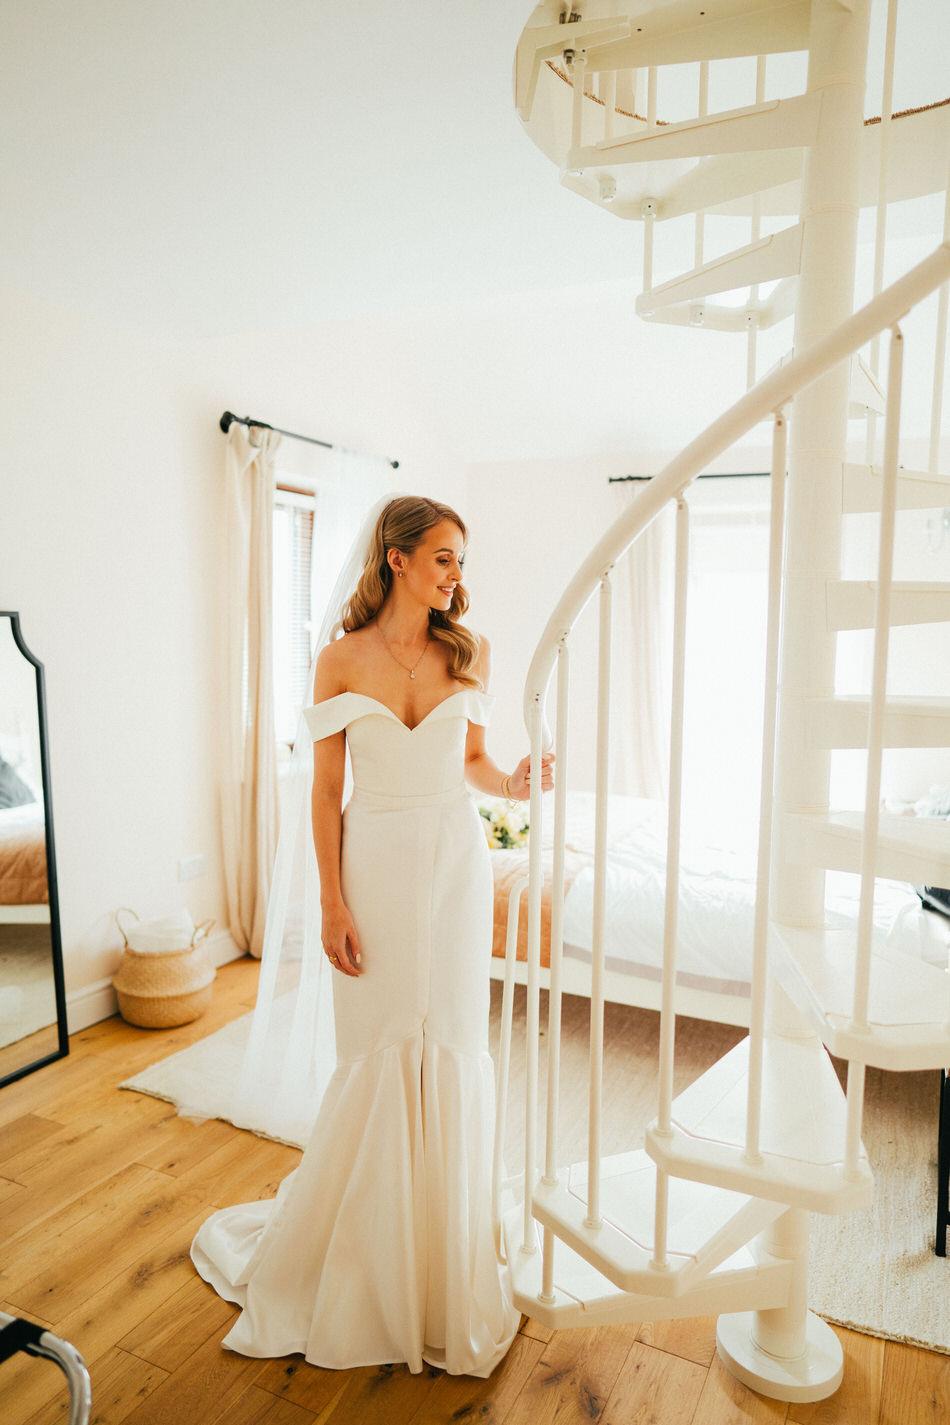 Castle-wedding-ireland-photos- 0069 51